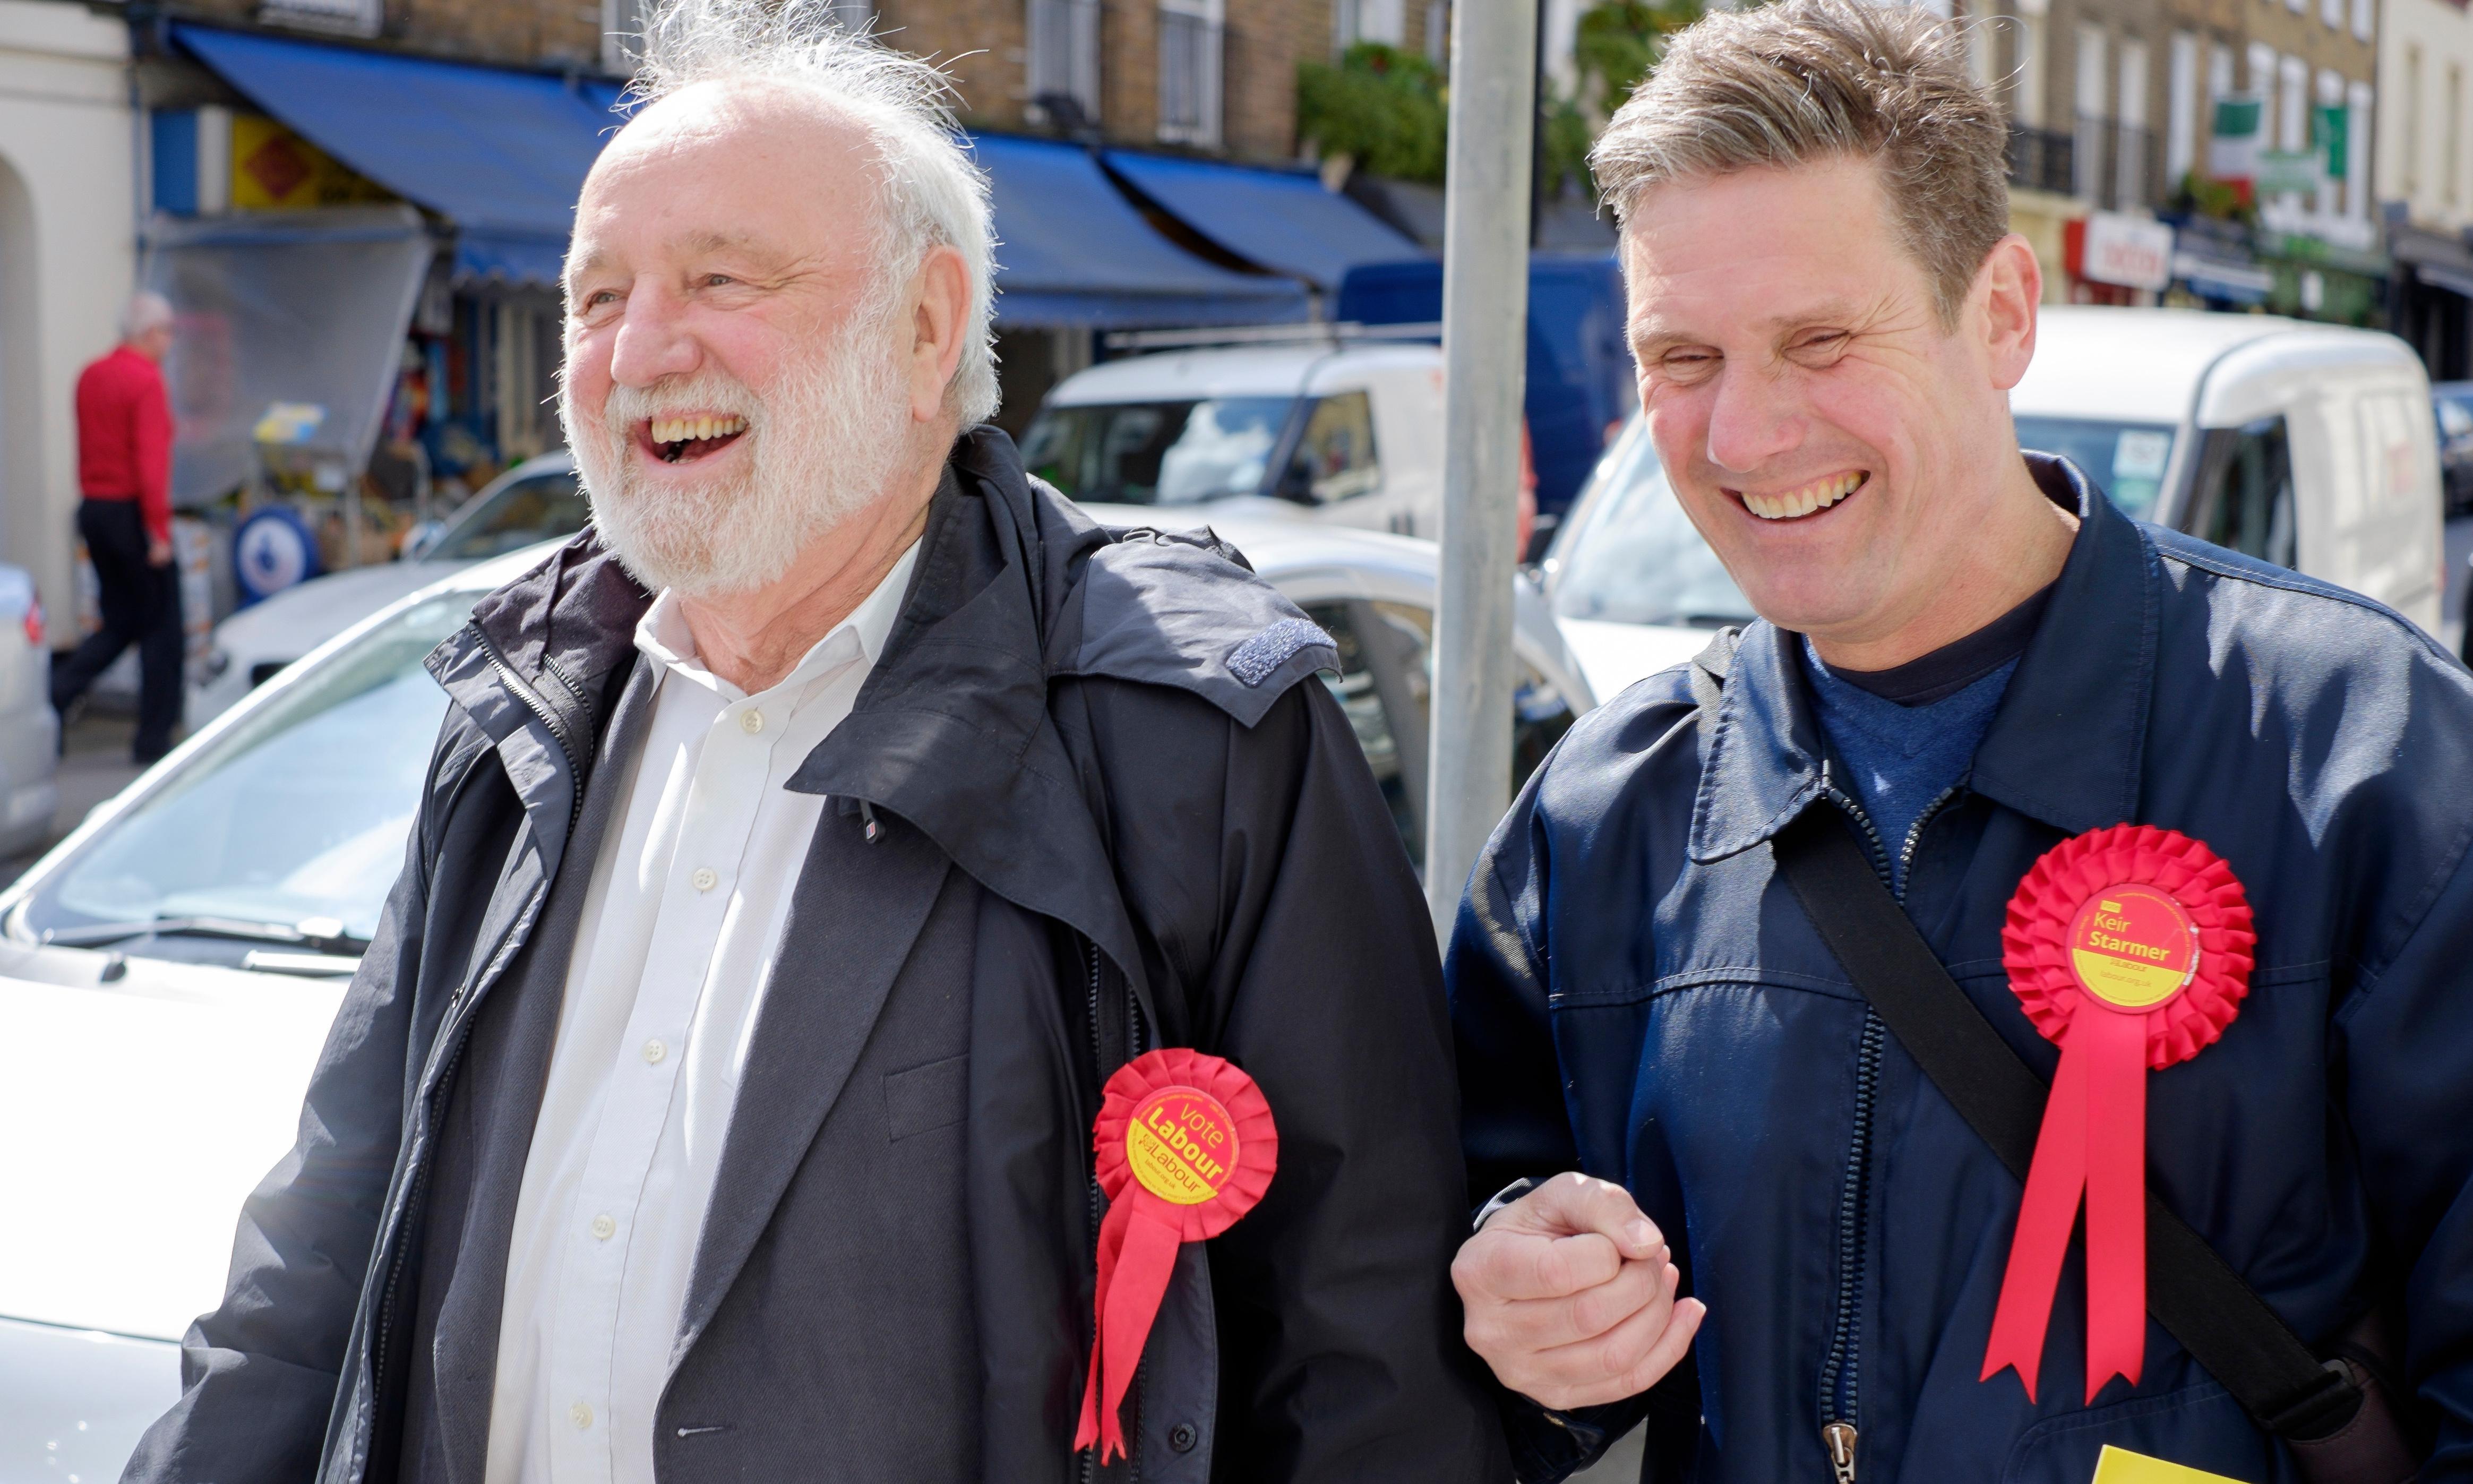 Frank Dobson, former Labour health secretary, dies